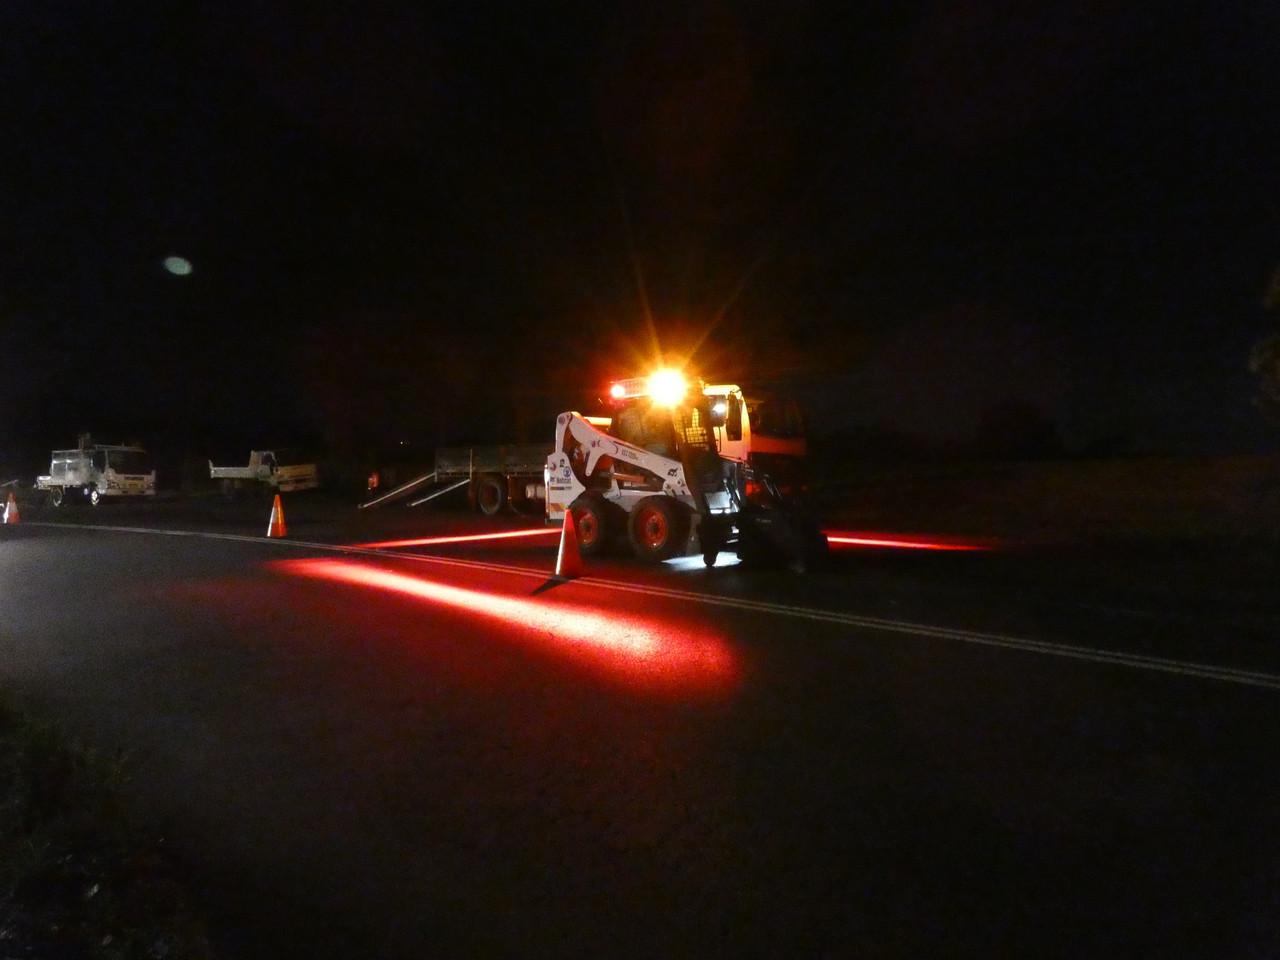 New 30 watt Safety Halo Light with Smart Technology